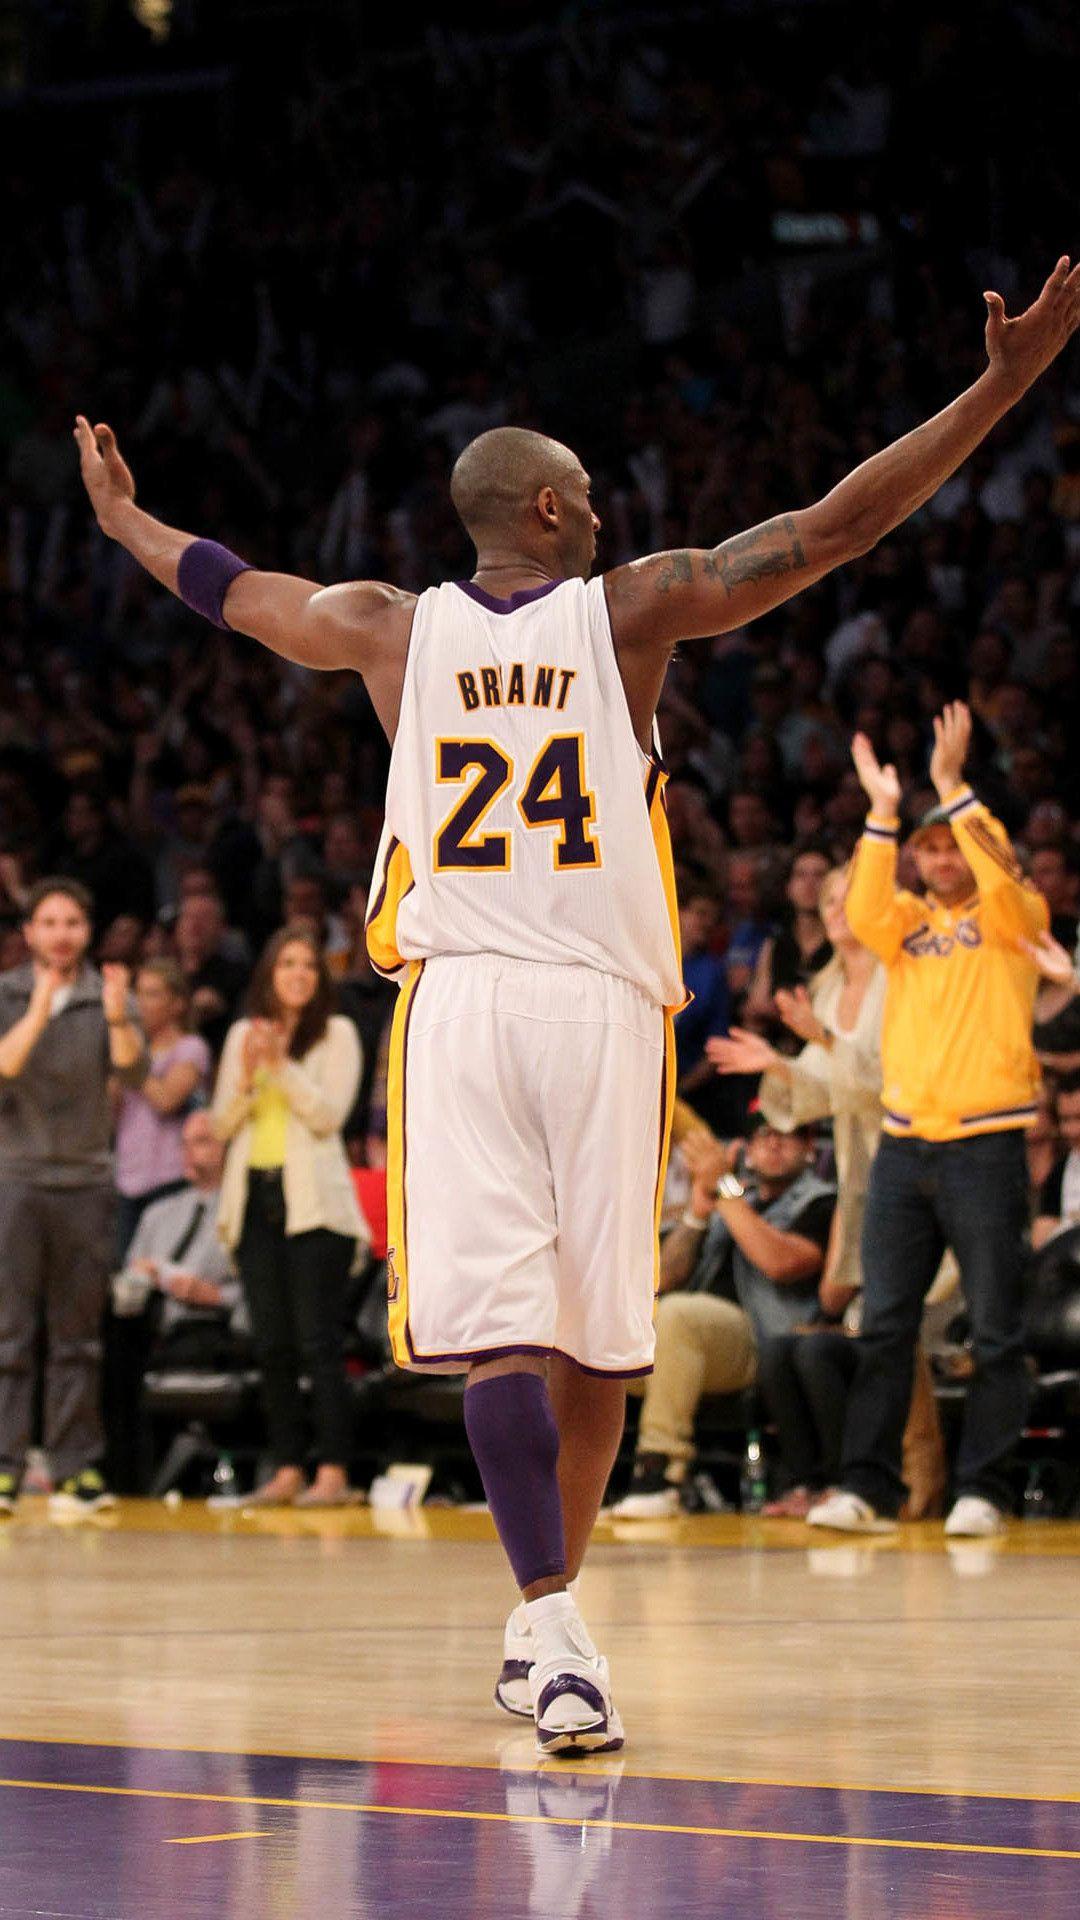 Kobe Bryant Iphone 6 Wallpaper 82 Images In 2020 Kobe Bryant Punkte